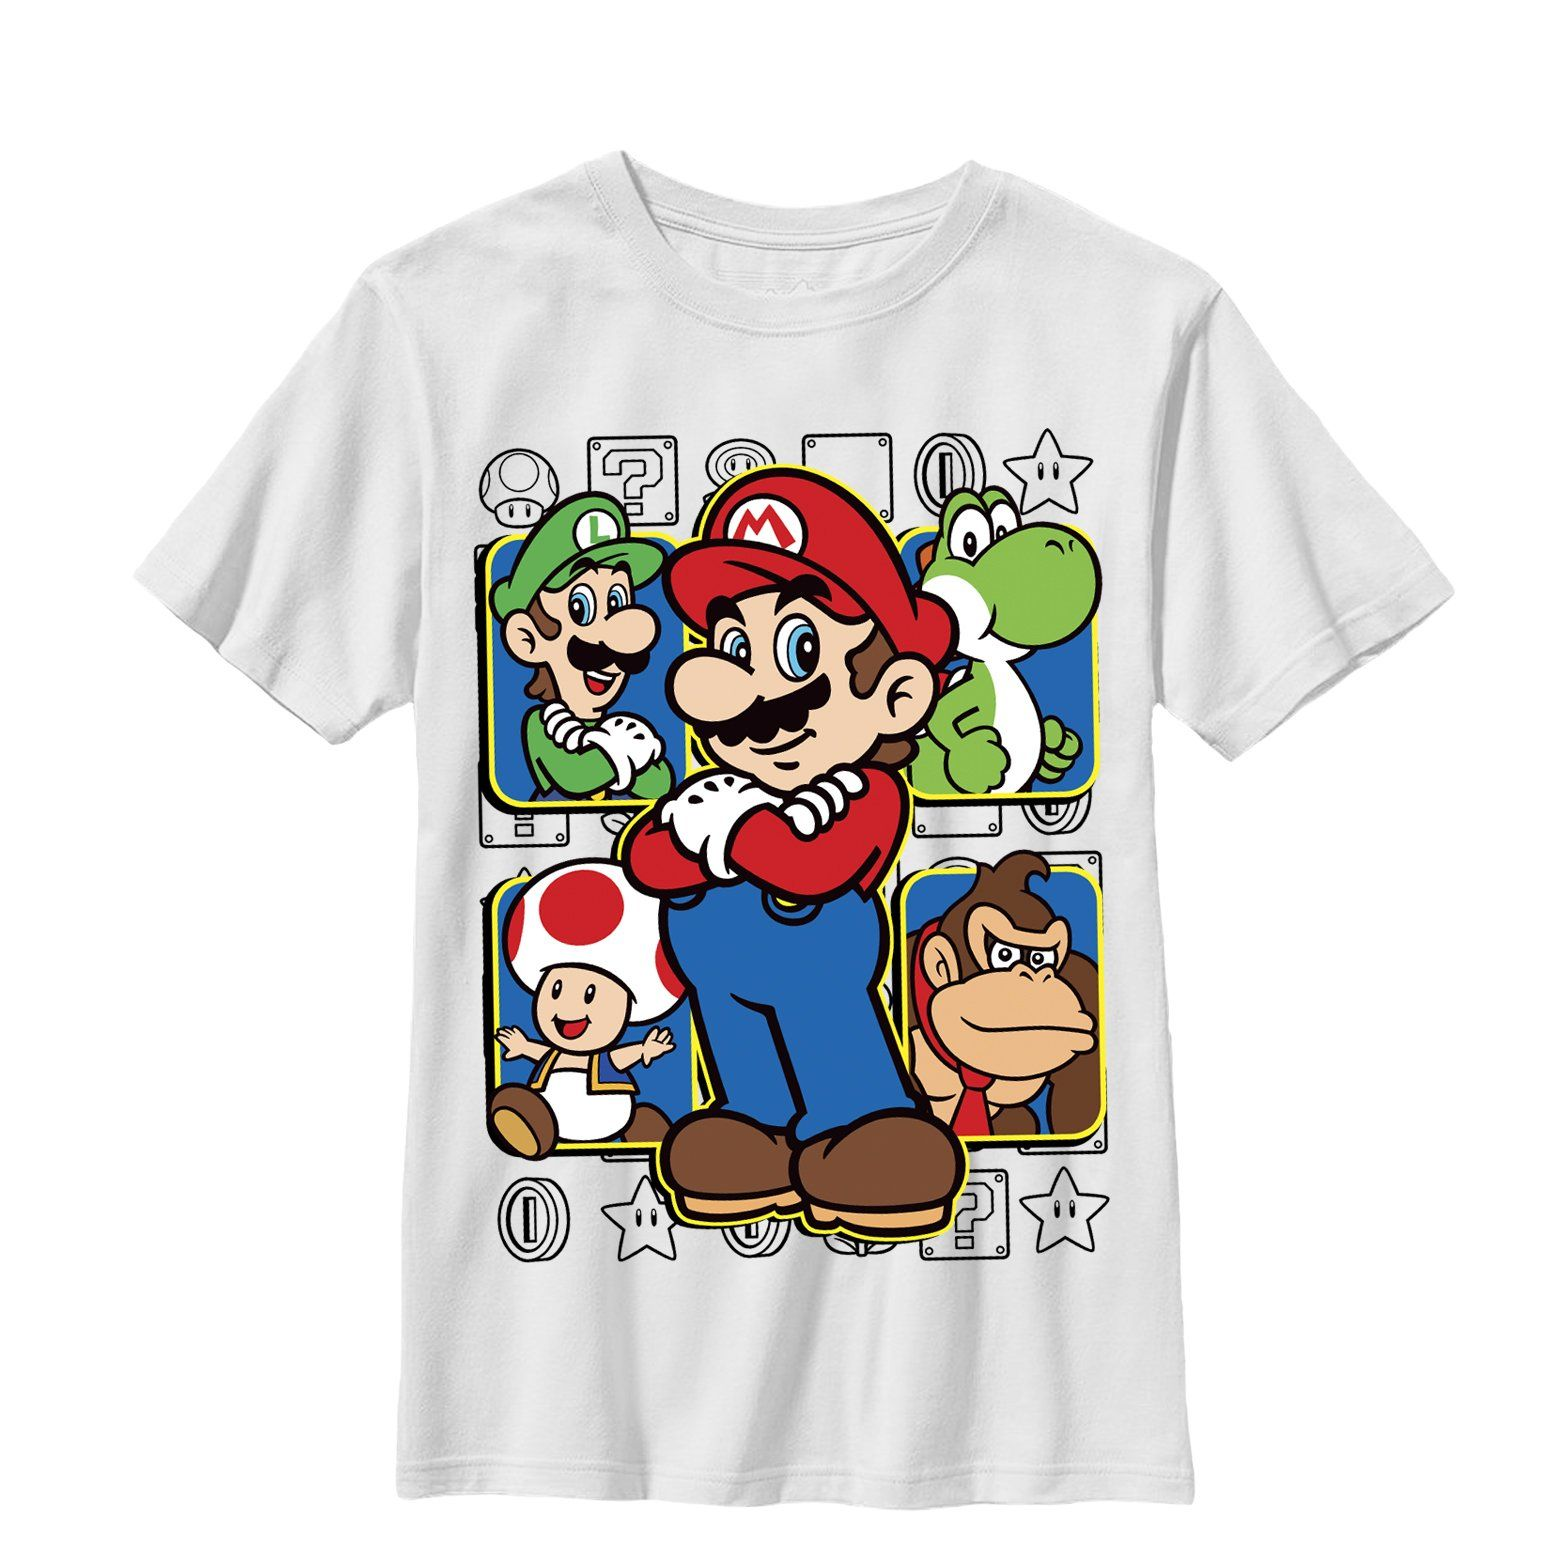 Nintendo Boy S Mario Super Squad T Shirt White White Graphic Tee Mario Graphic Tees [ 1550 x 1550 Pixel ]